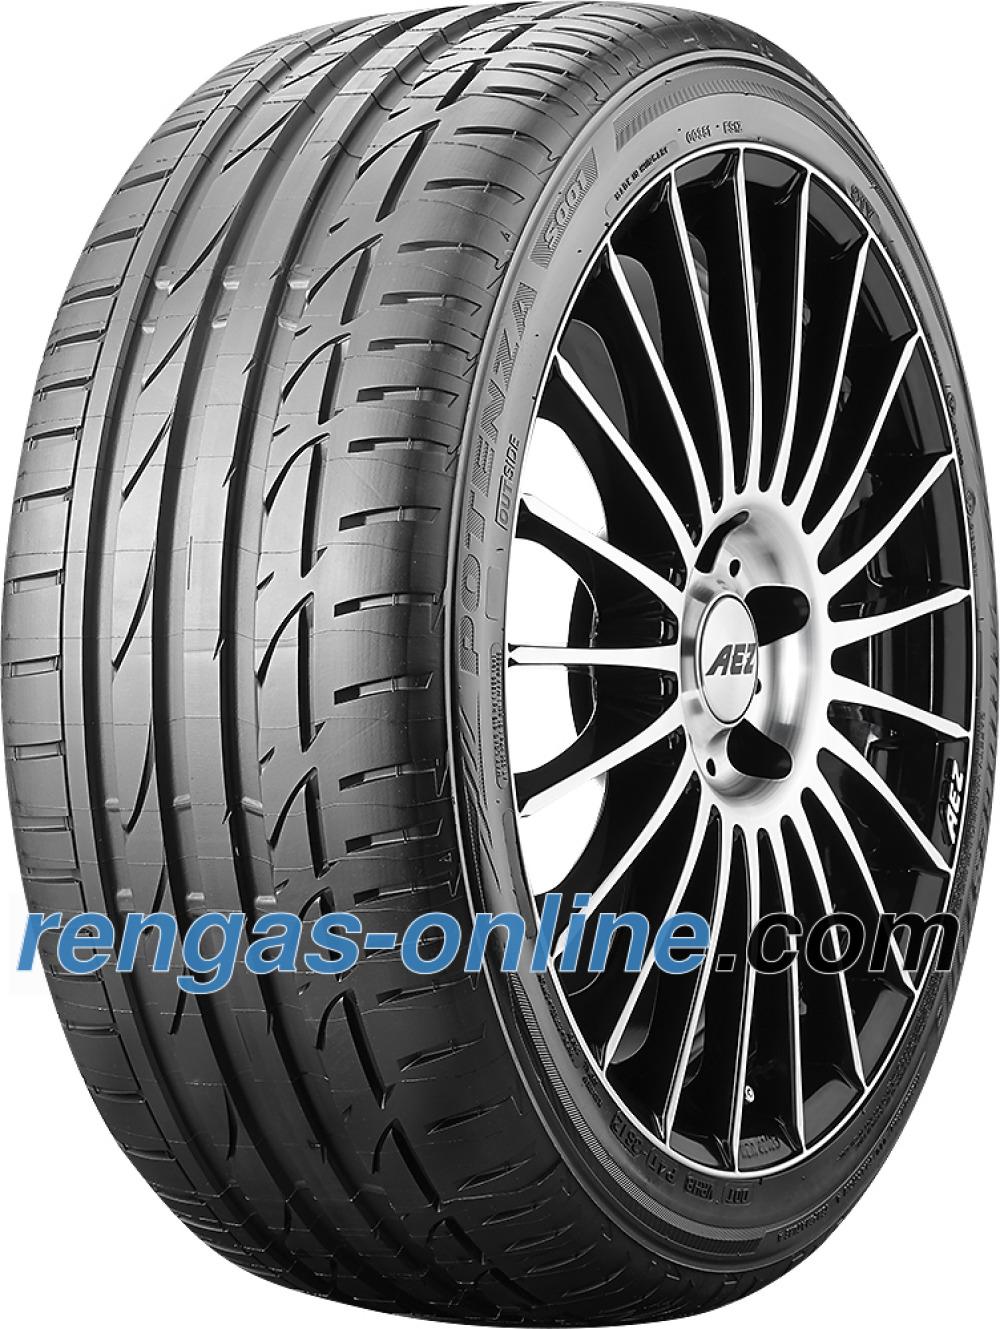 bridgestone-potenza-s001-25545-r18-99y-vannesuojalla-mfs